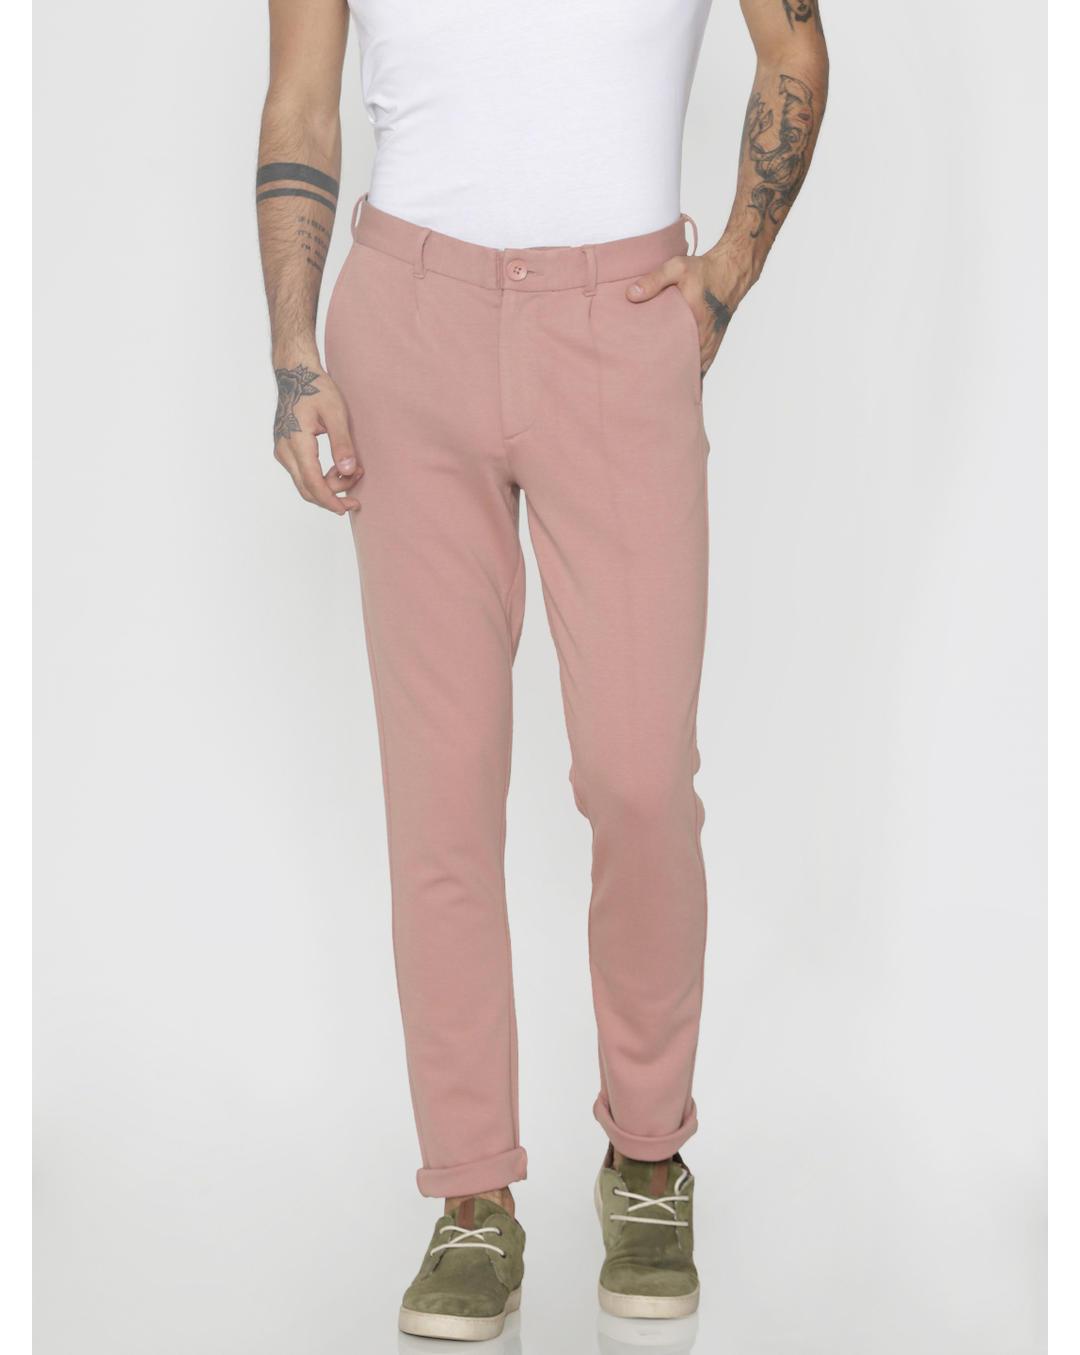 wholesale online various design quality Buy Jack & Jones Pink Slim Fit Pants Online | Jack & Jones